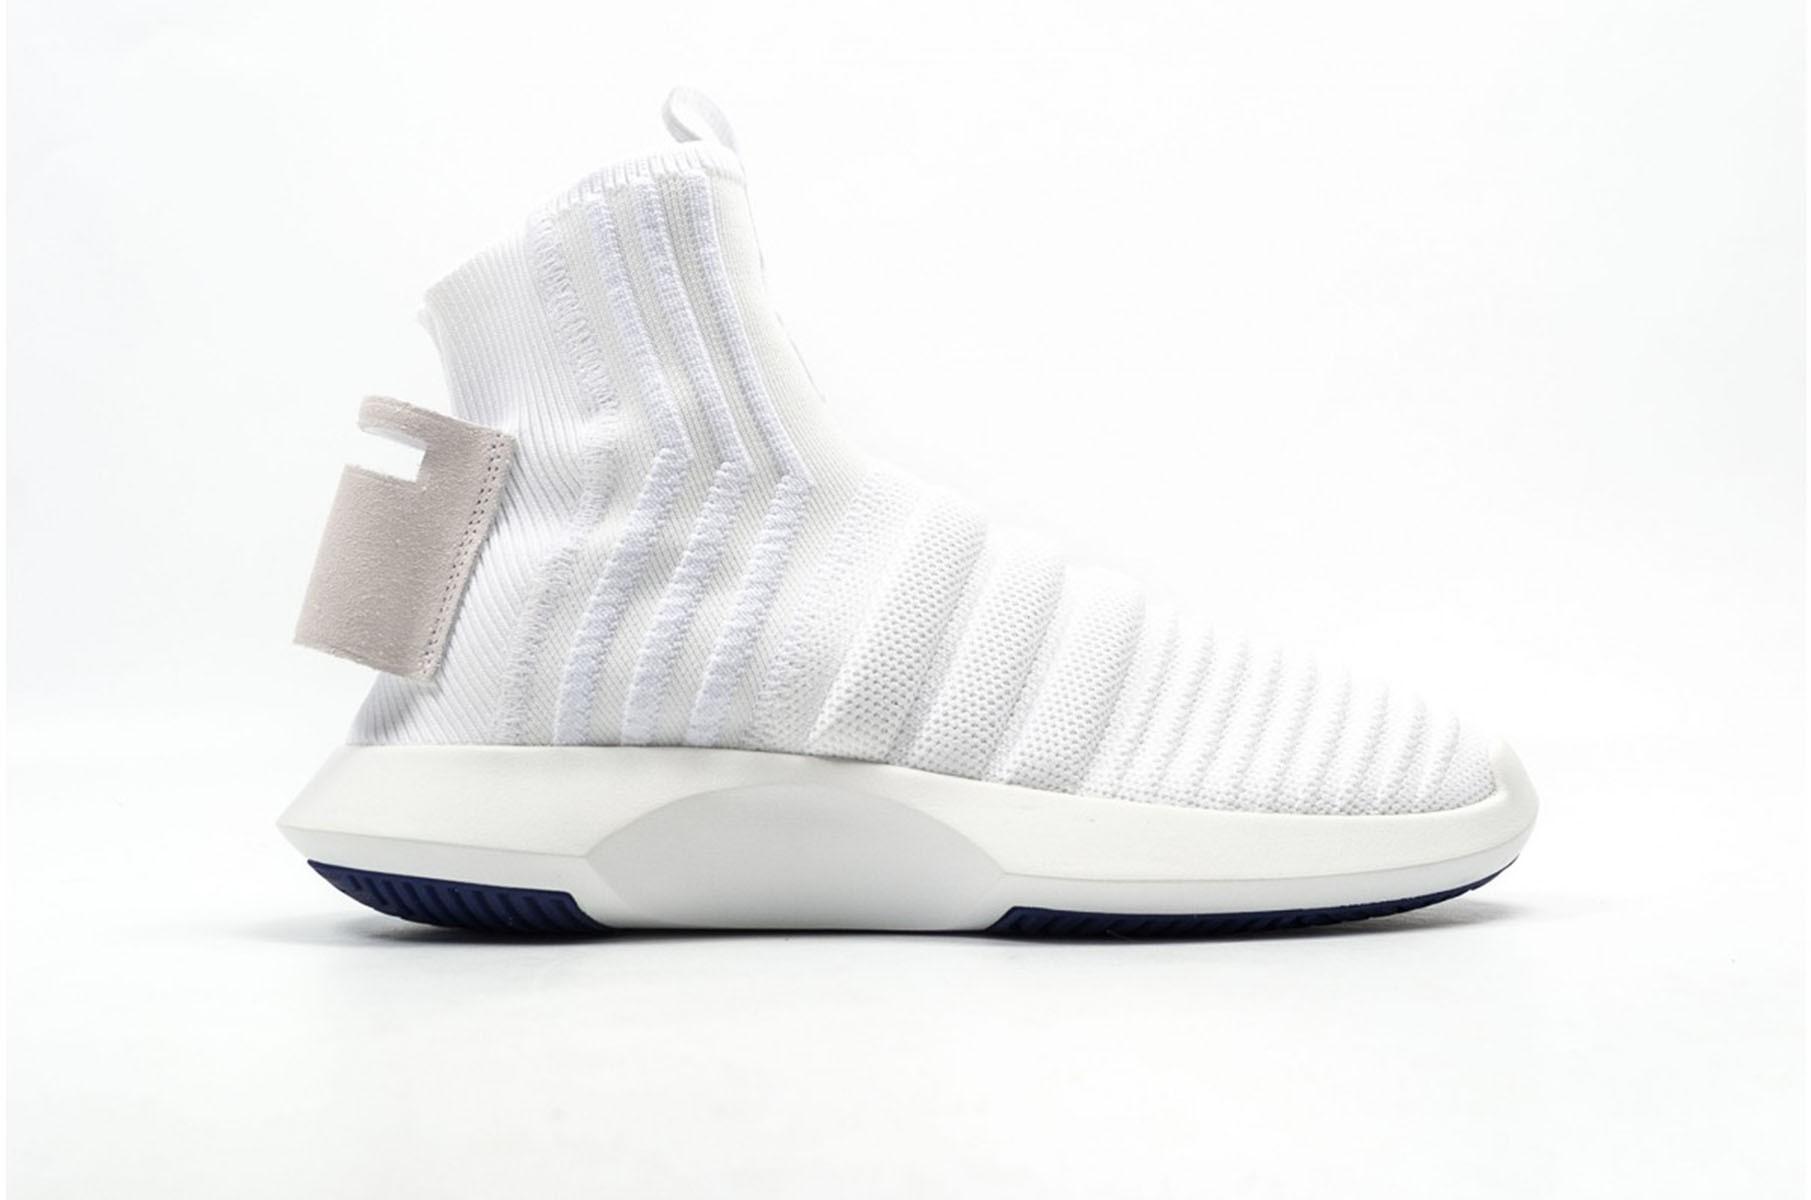 premium selection daea4 547e8 Scarpe uomo sneakers ADIDAS CRAZY 1 ADV PRIMEKNIT SOCK in tessuto bianco  CQ1012